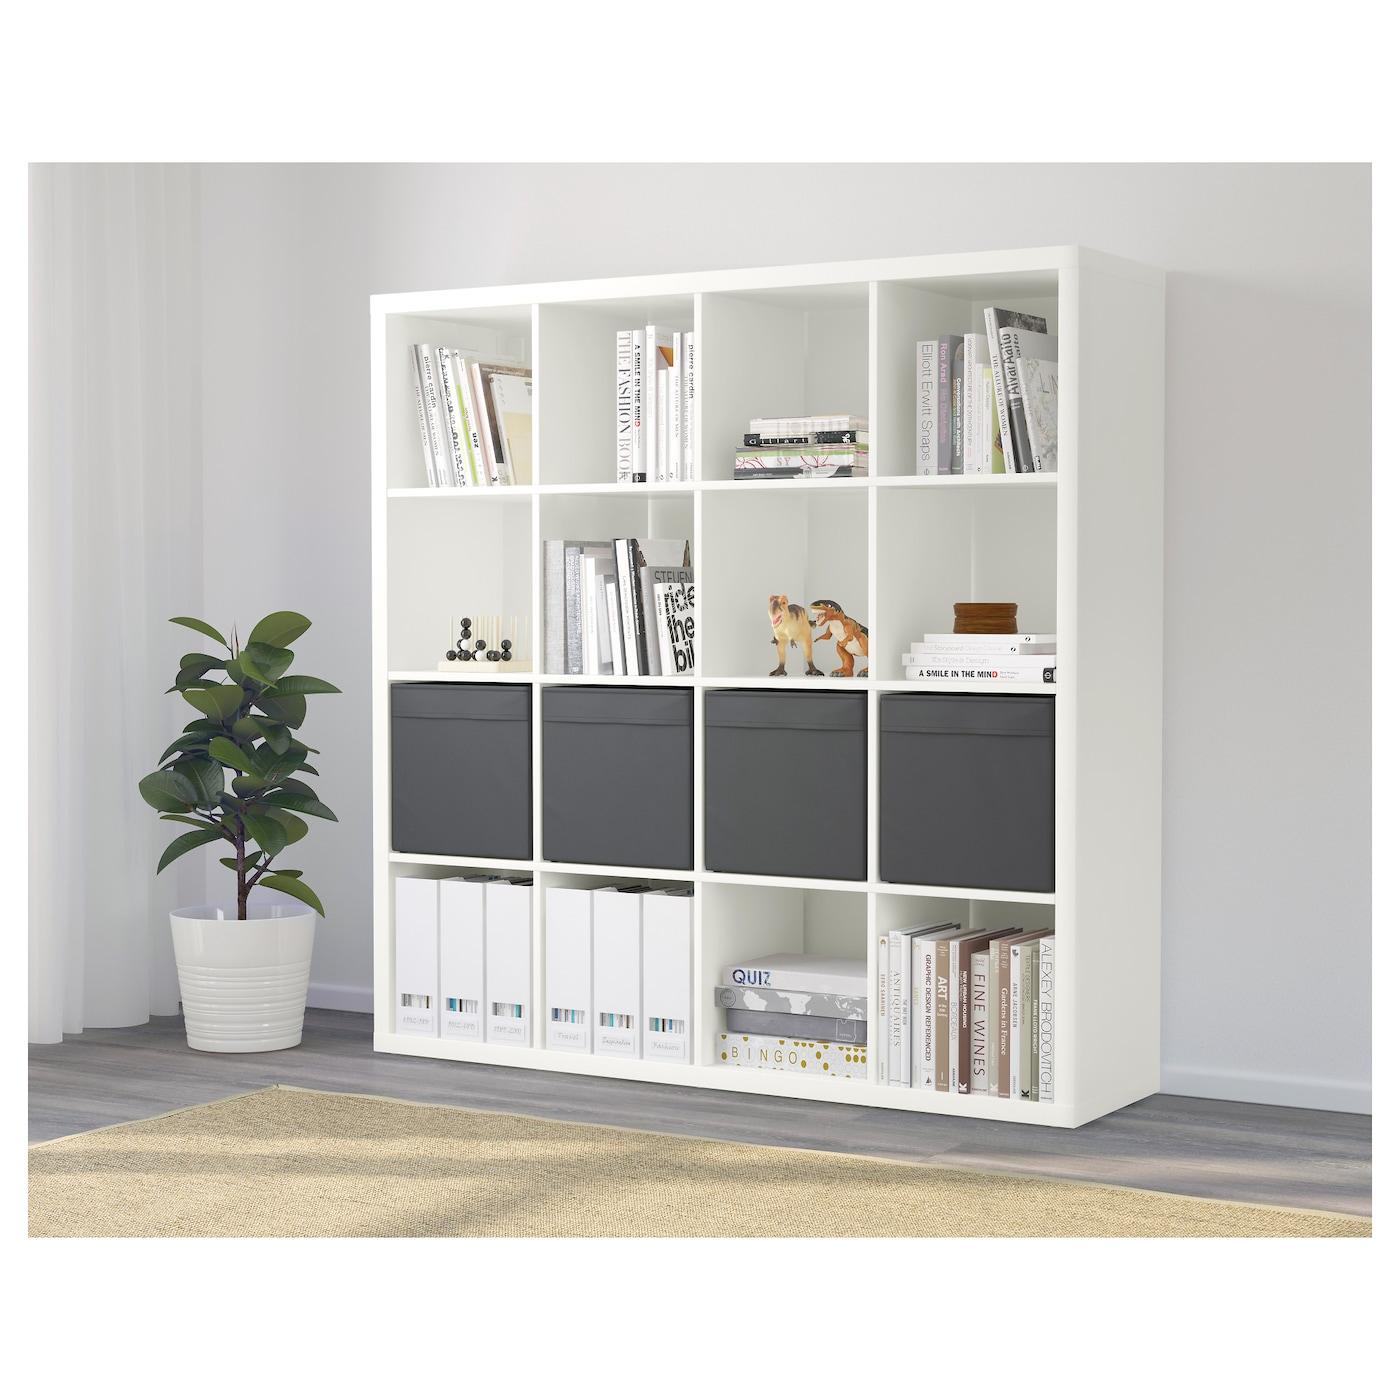 kallax dr na shelving unit with 4 inserts white 147x147 cm ikea. Black Bedroom Furniture Sets. Home Design Ideas